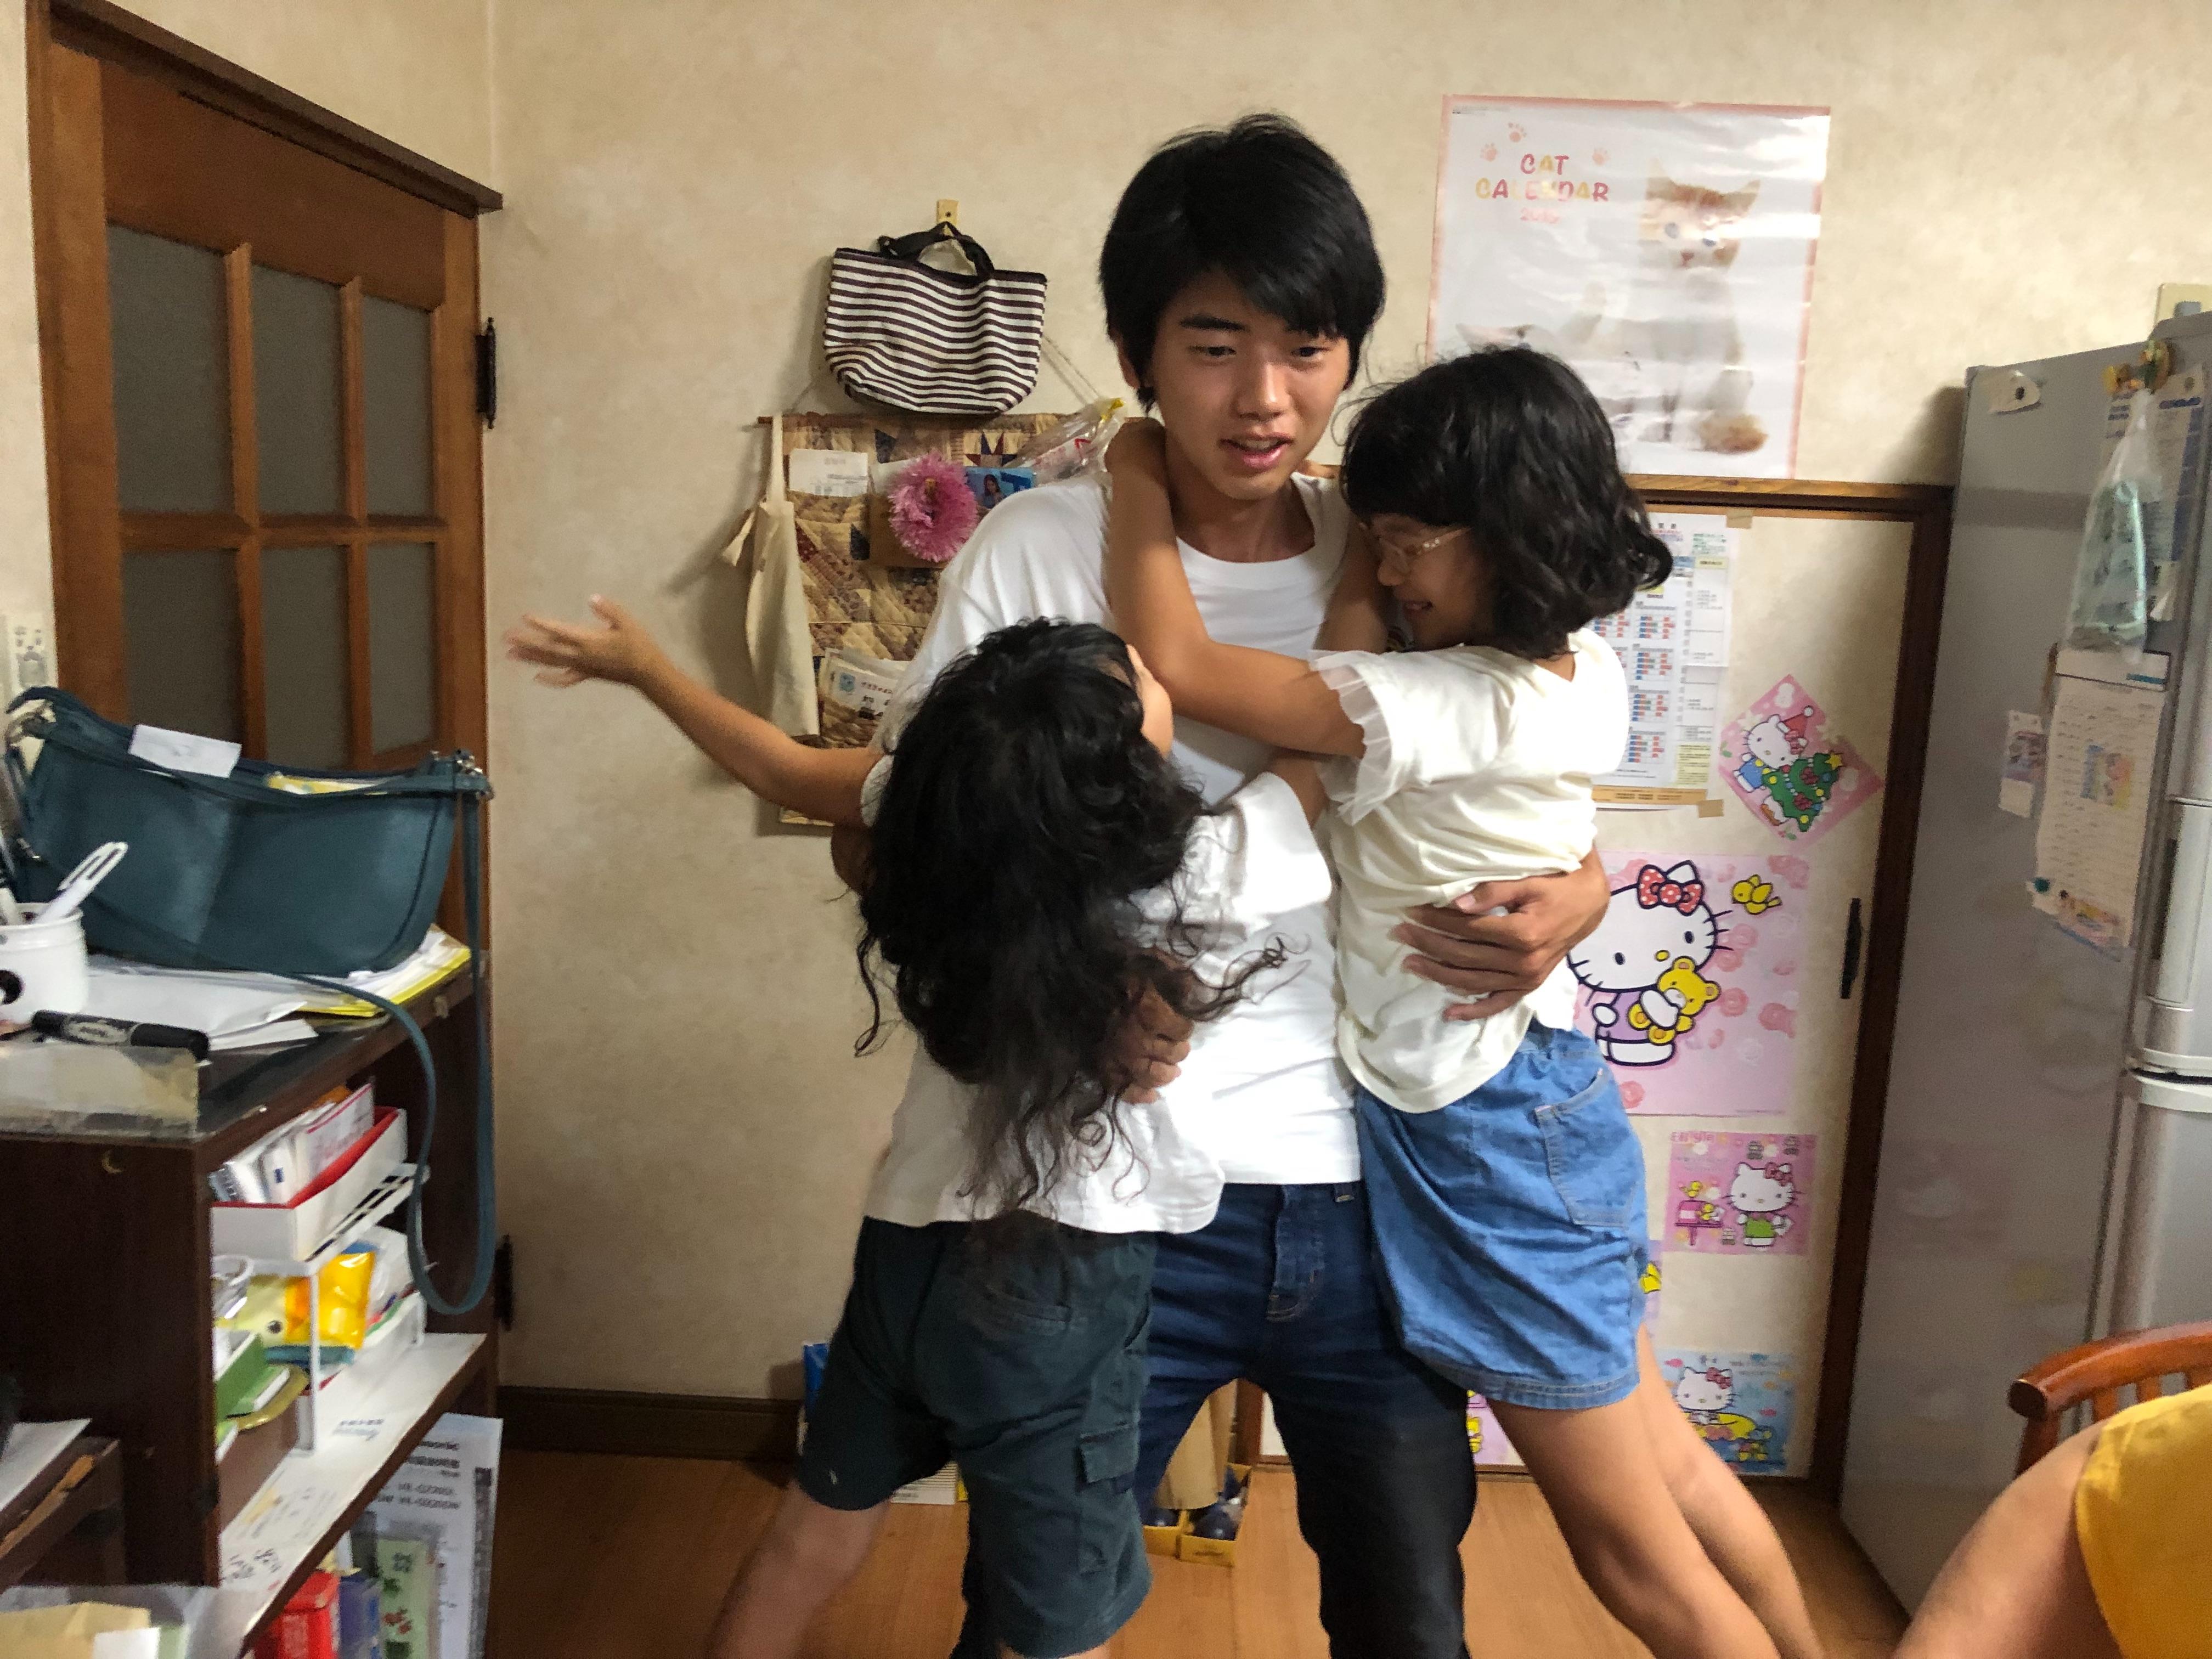 f:id:masanori-kato1972:20190811204949j:image